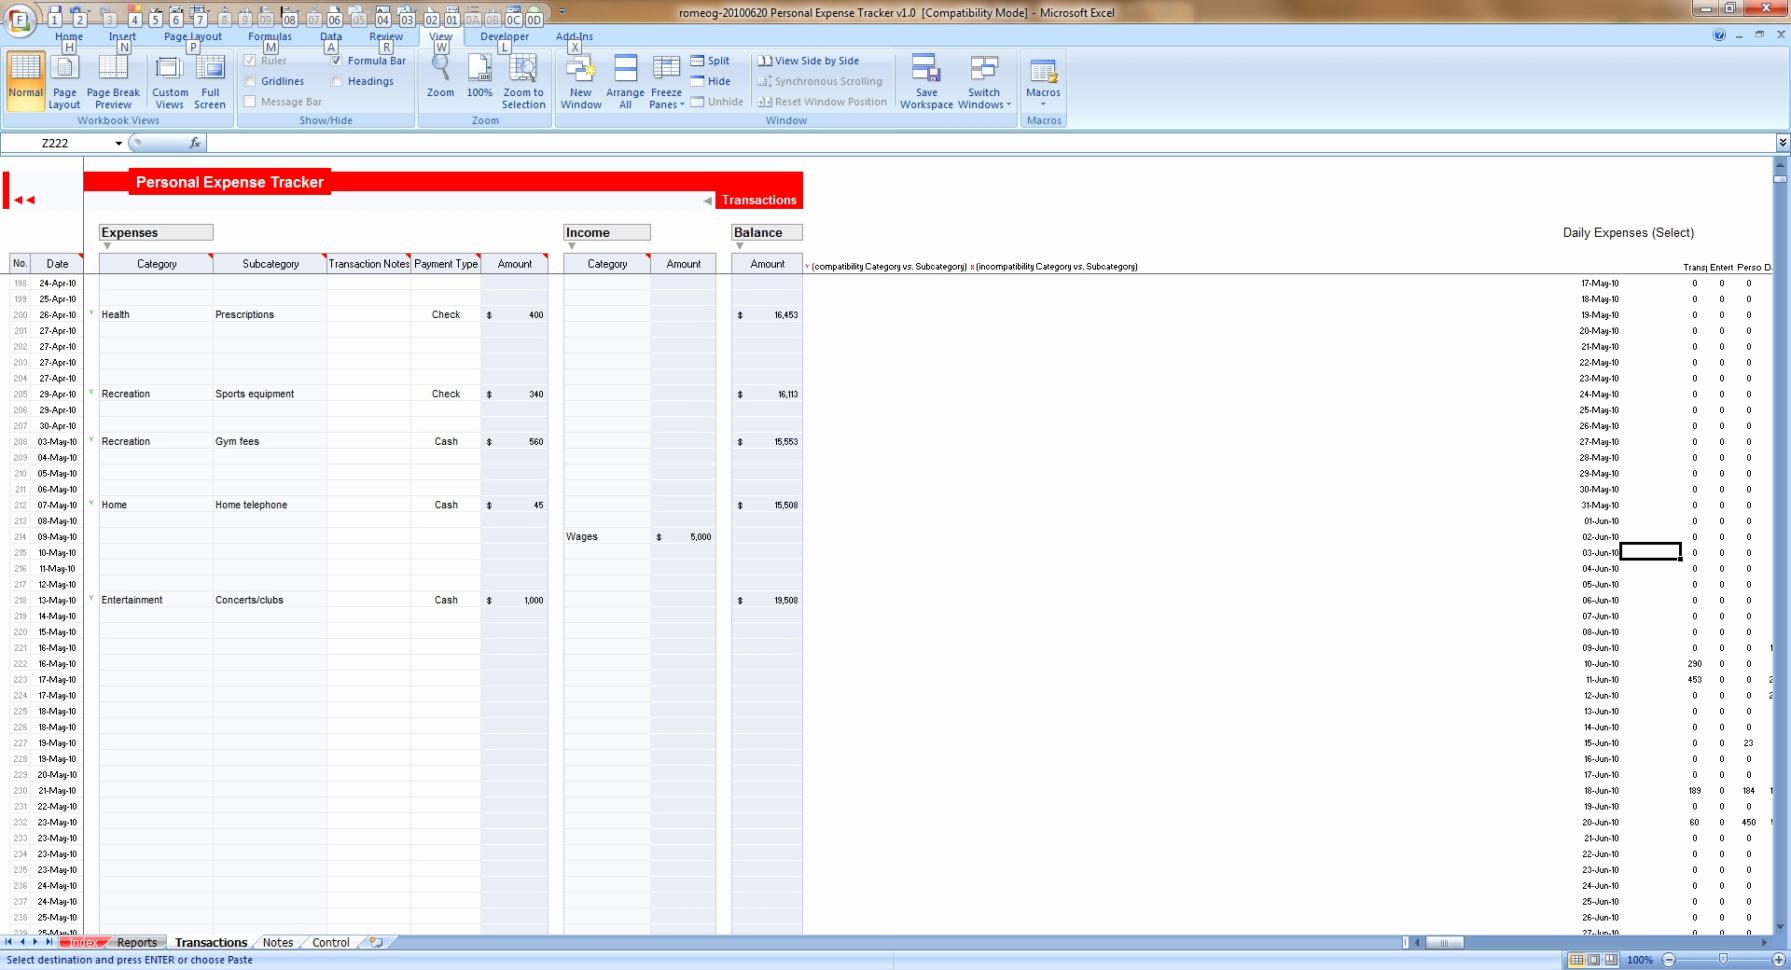 Sleep Tracking Spreadsheet With Expense Tracker Spreadsheet Debt Stackingl Awesome Europeipsleep Of